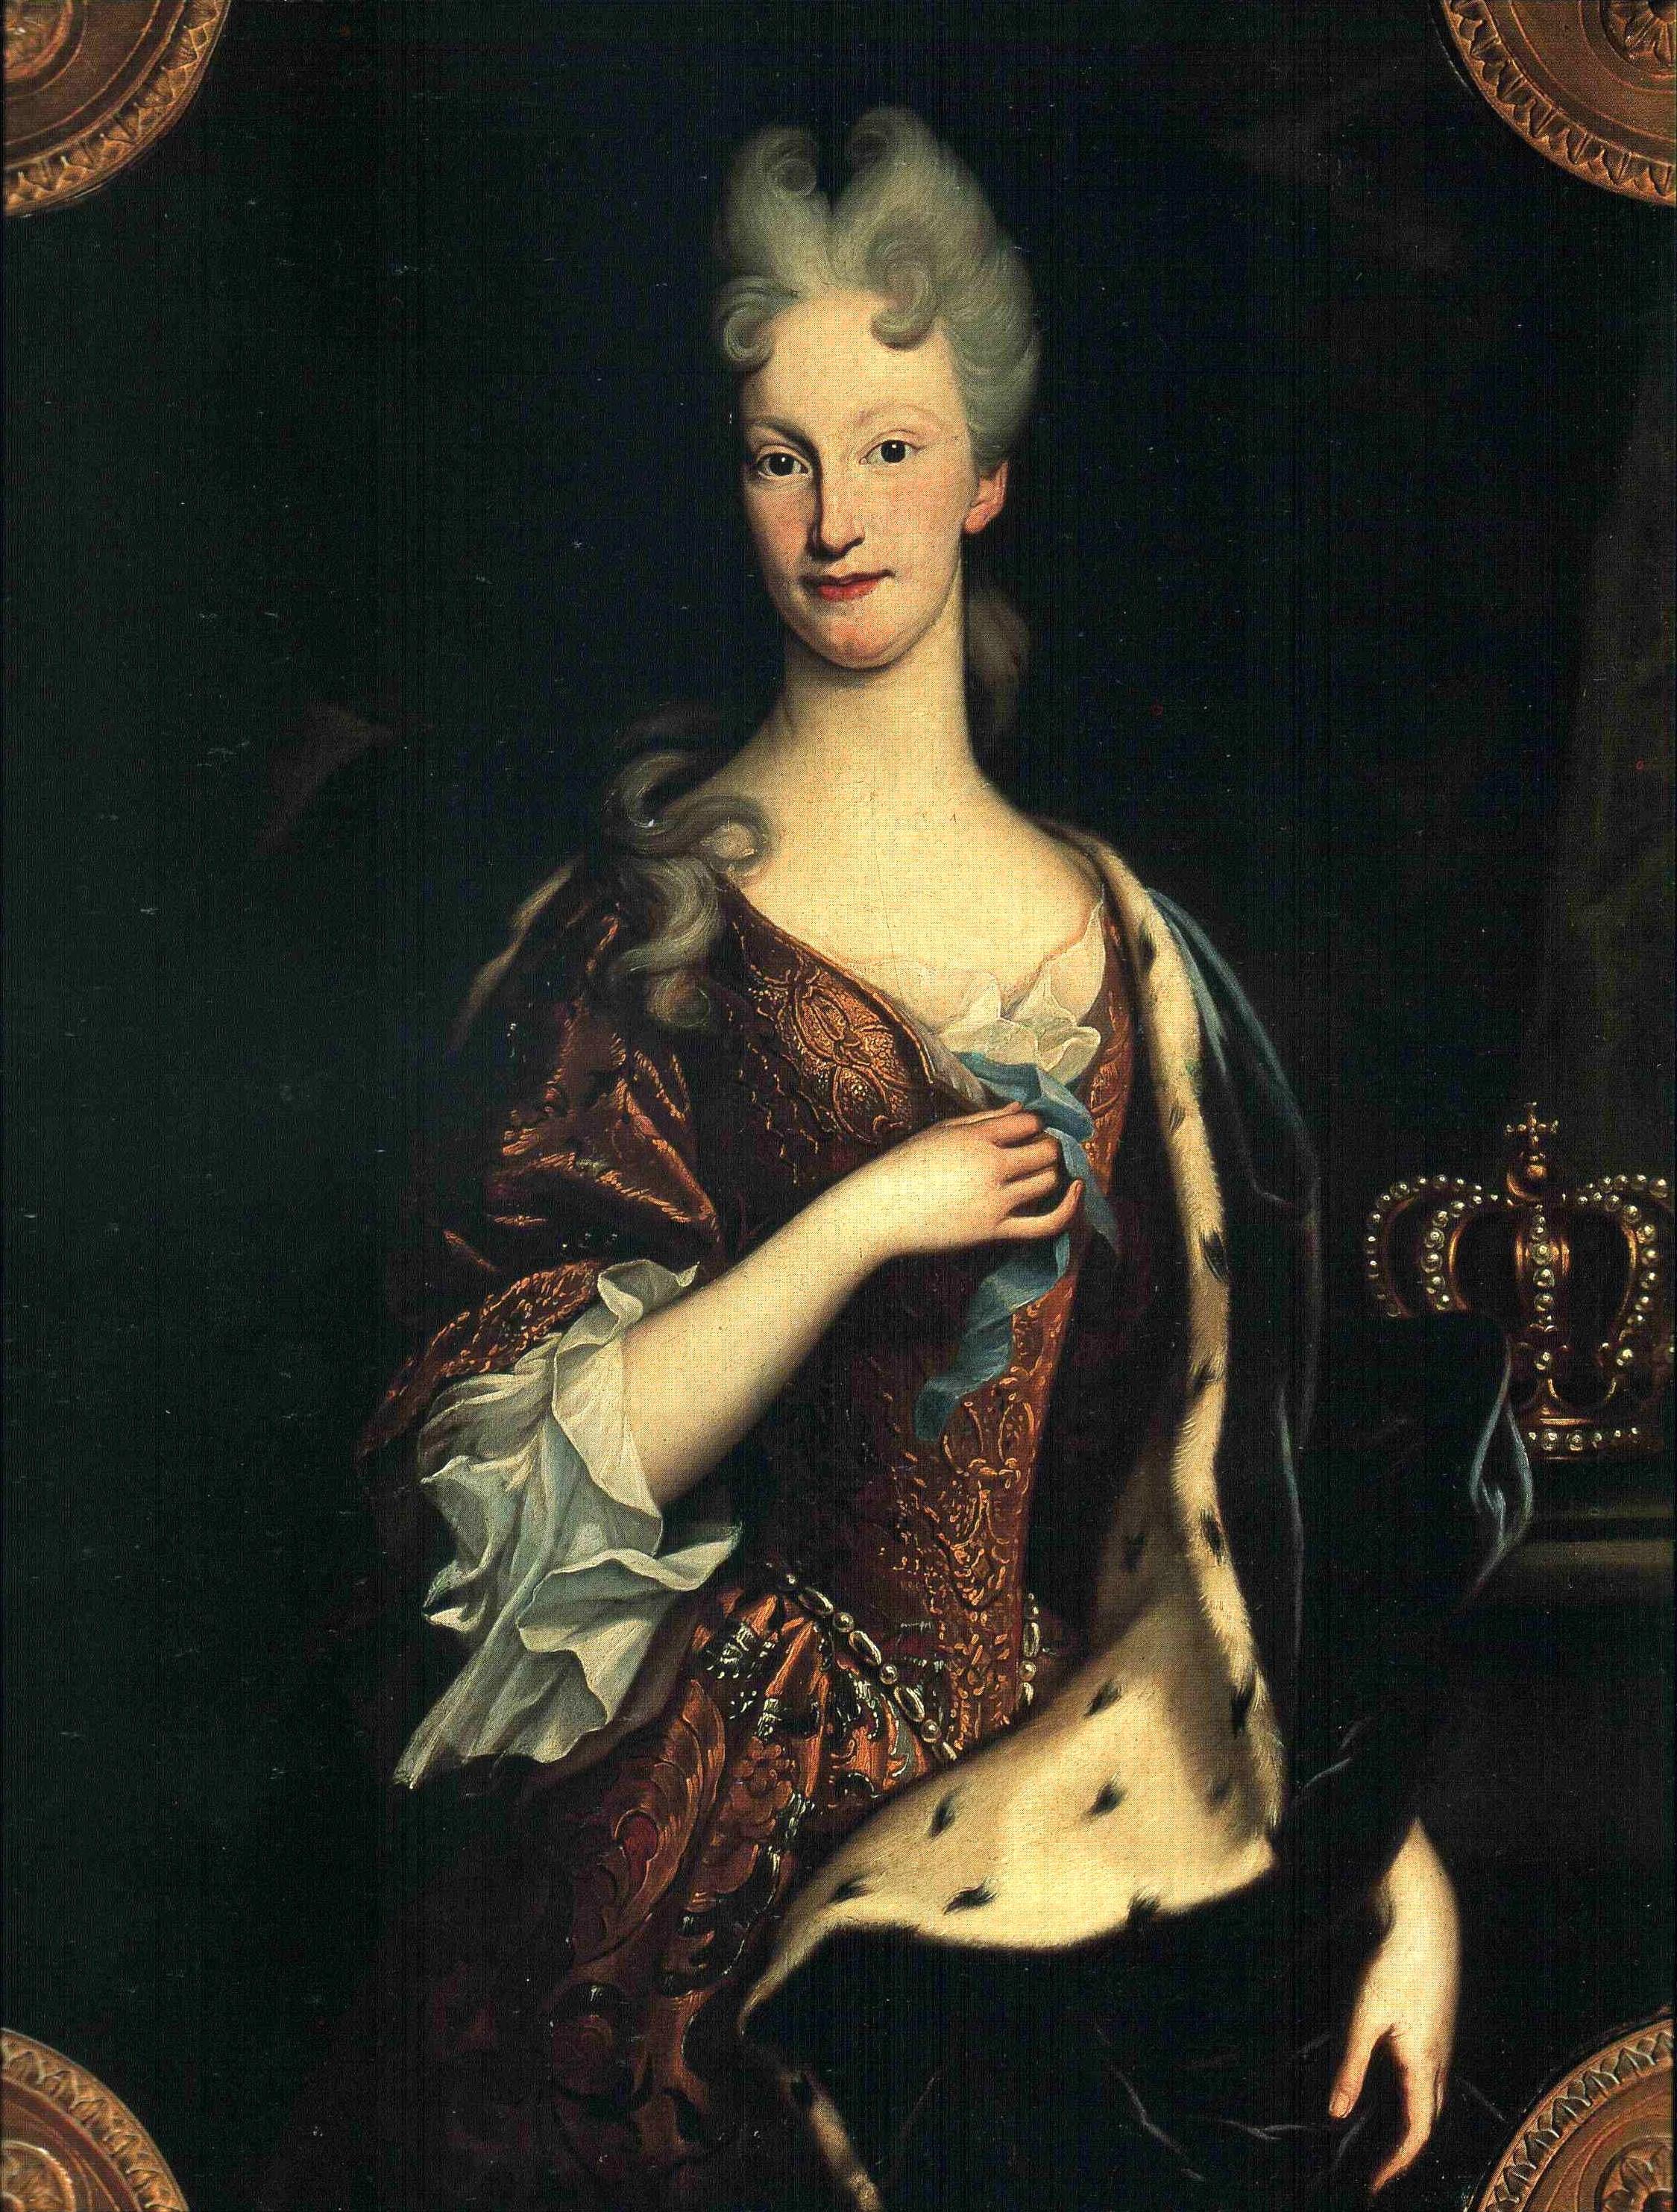 File:Elisabetta Farnese 1692-1766.jpg